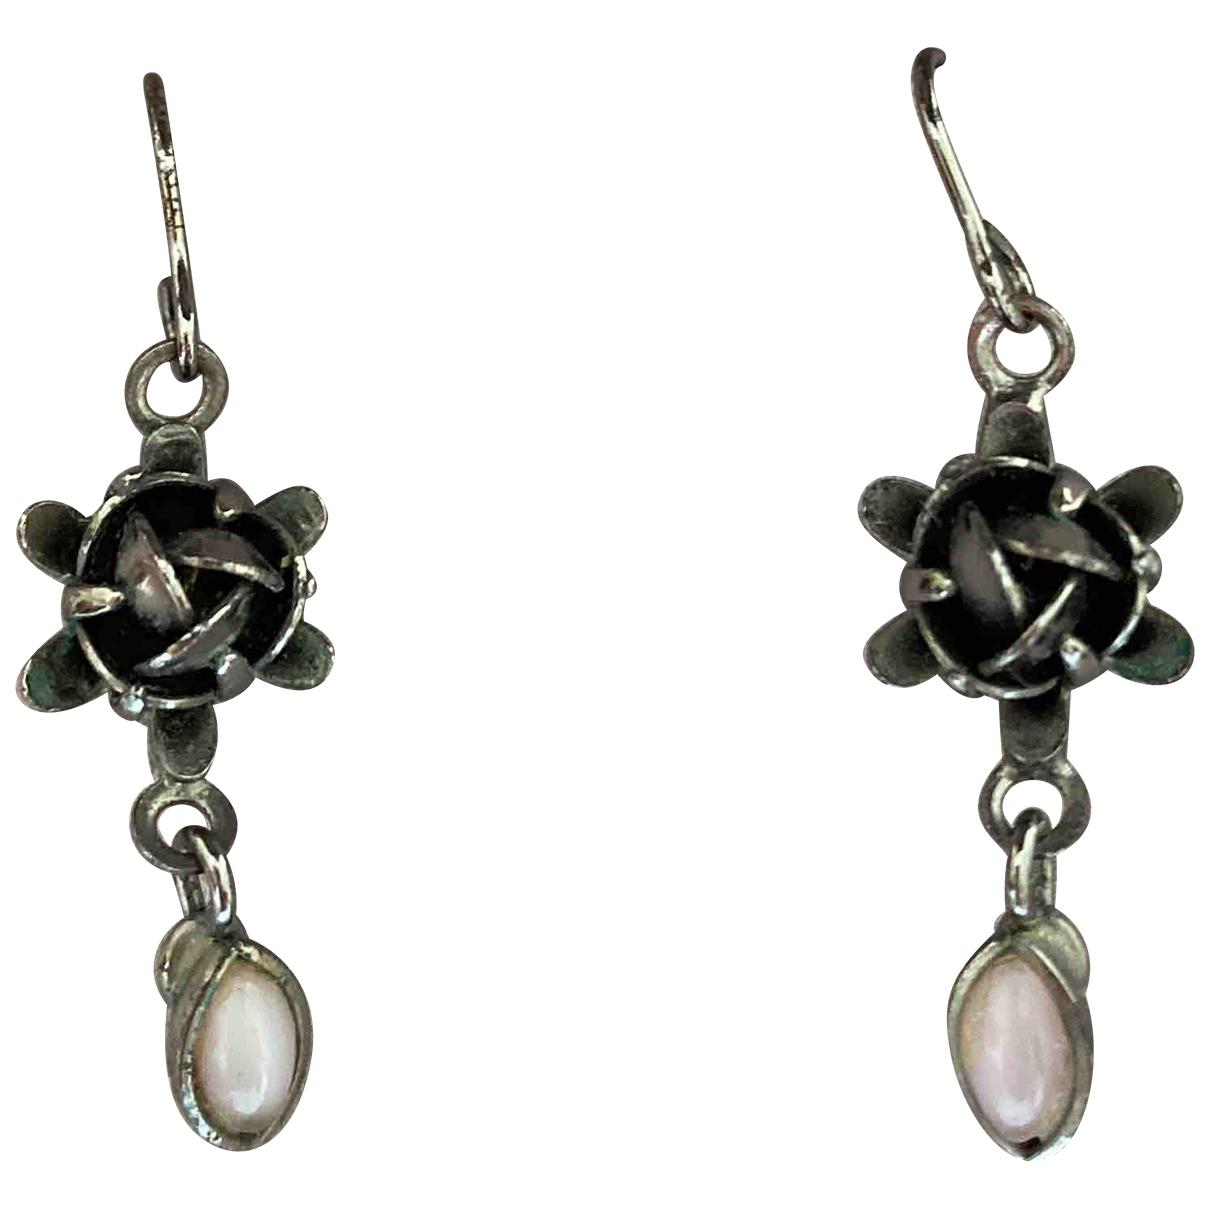 Non Signé / Unsigned Motifs Floraux Silver Metal Earrings for Women N